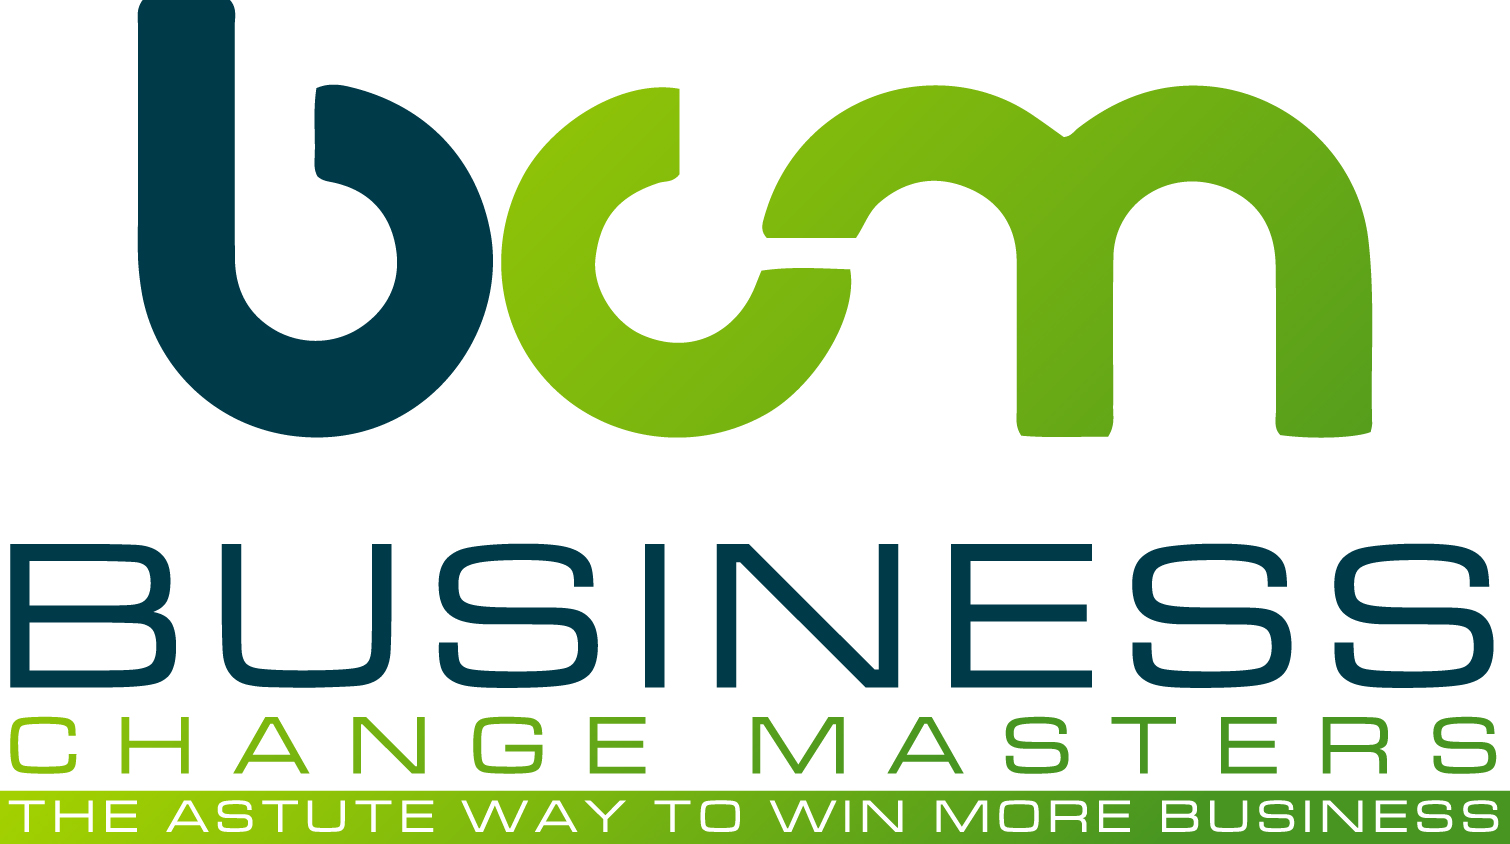 Business Change Masters  FF.jpg